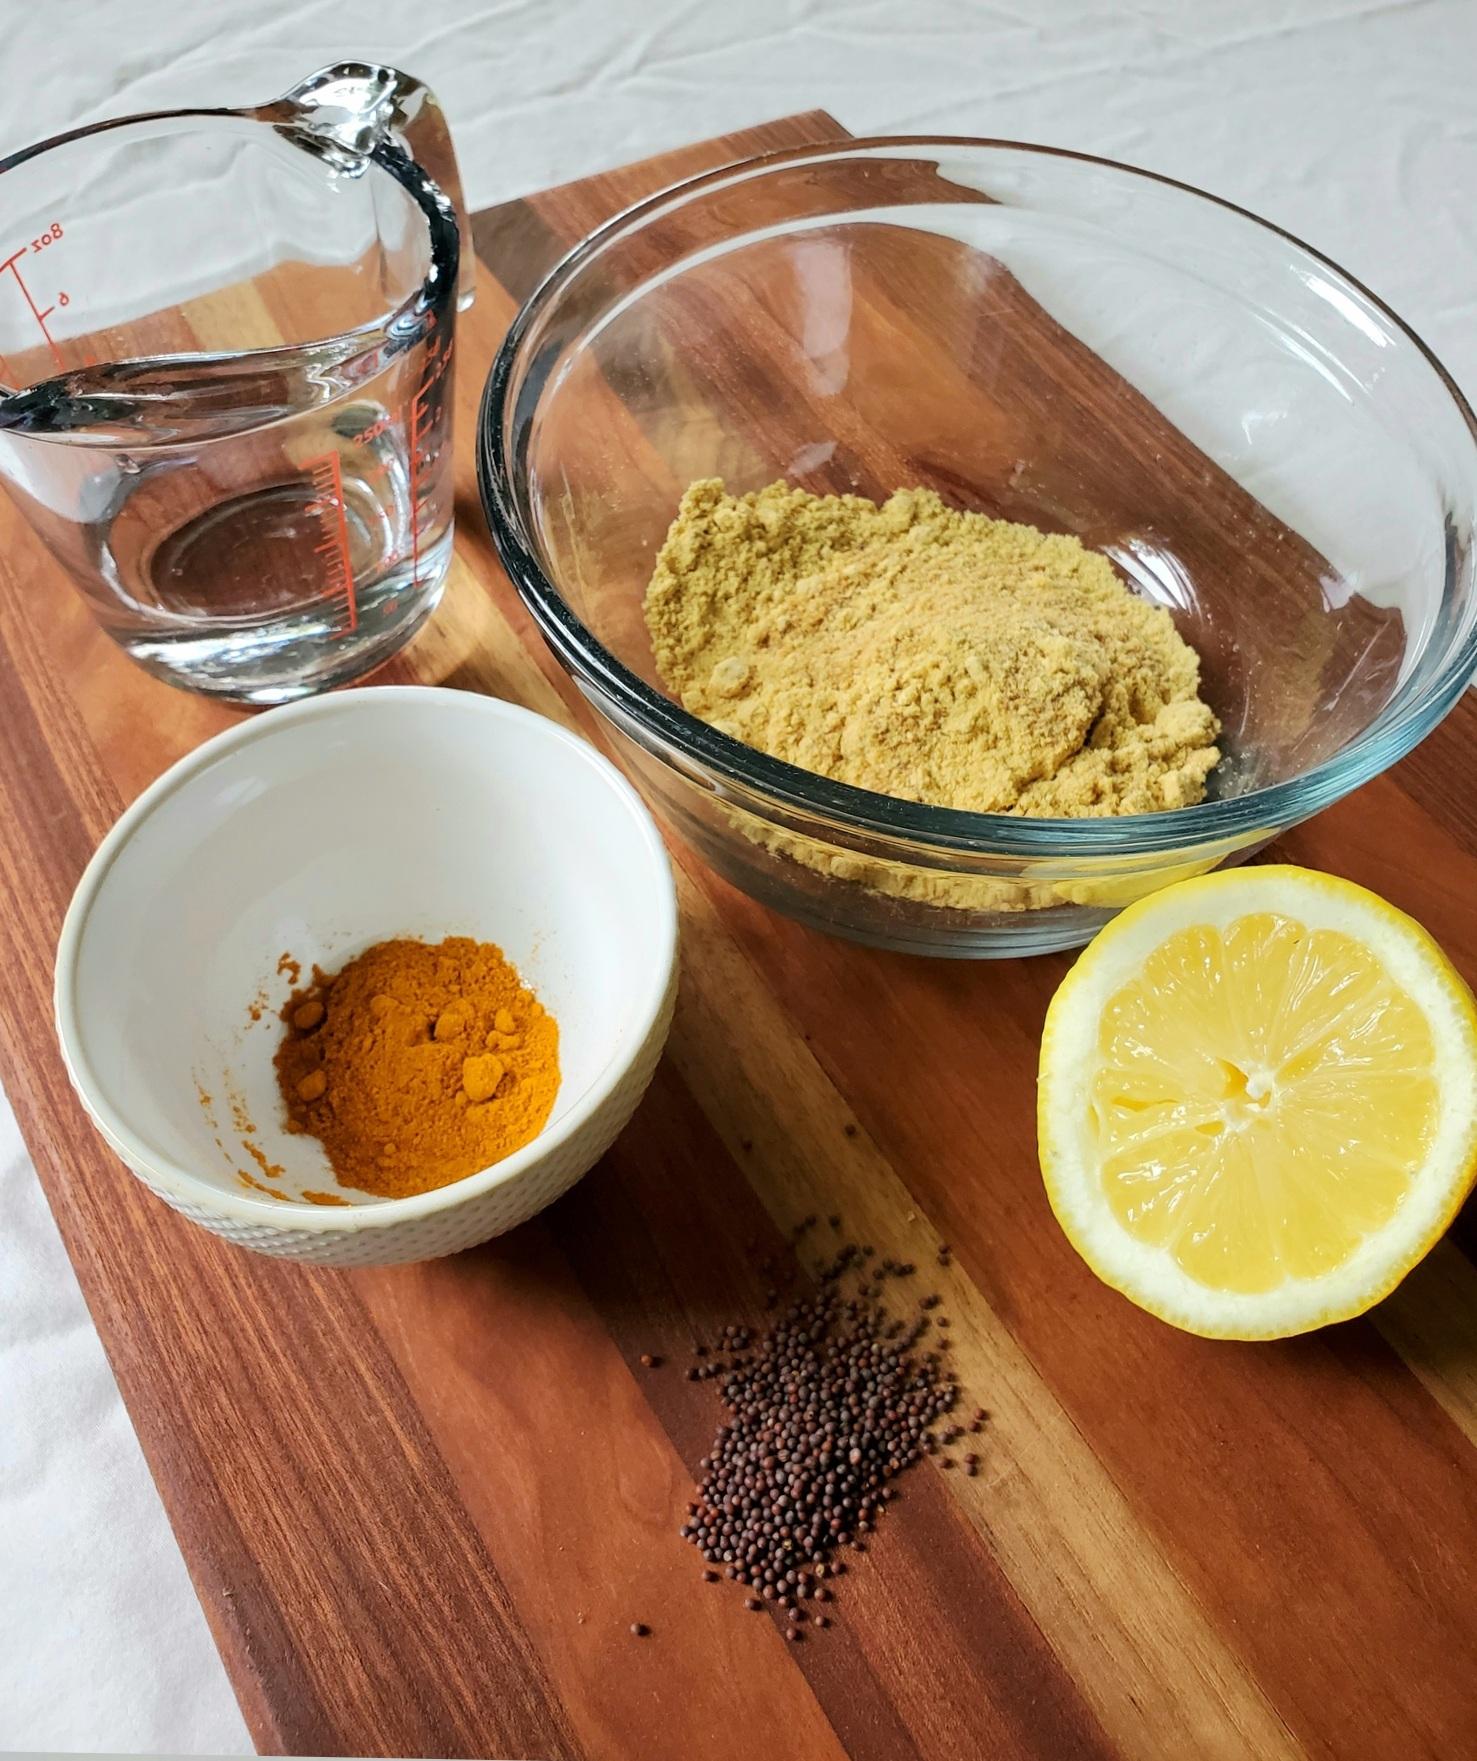 rsz_mustard_ingredients__1.jpg